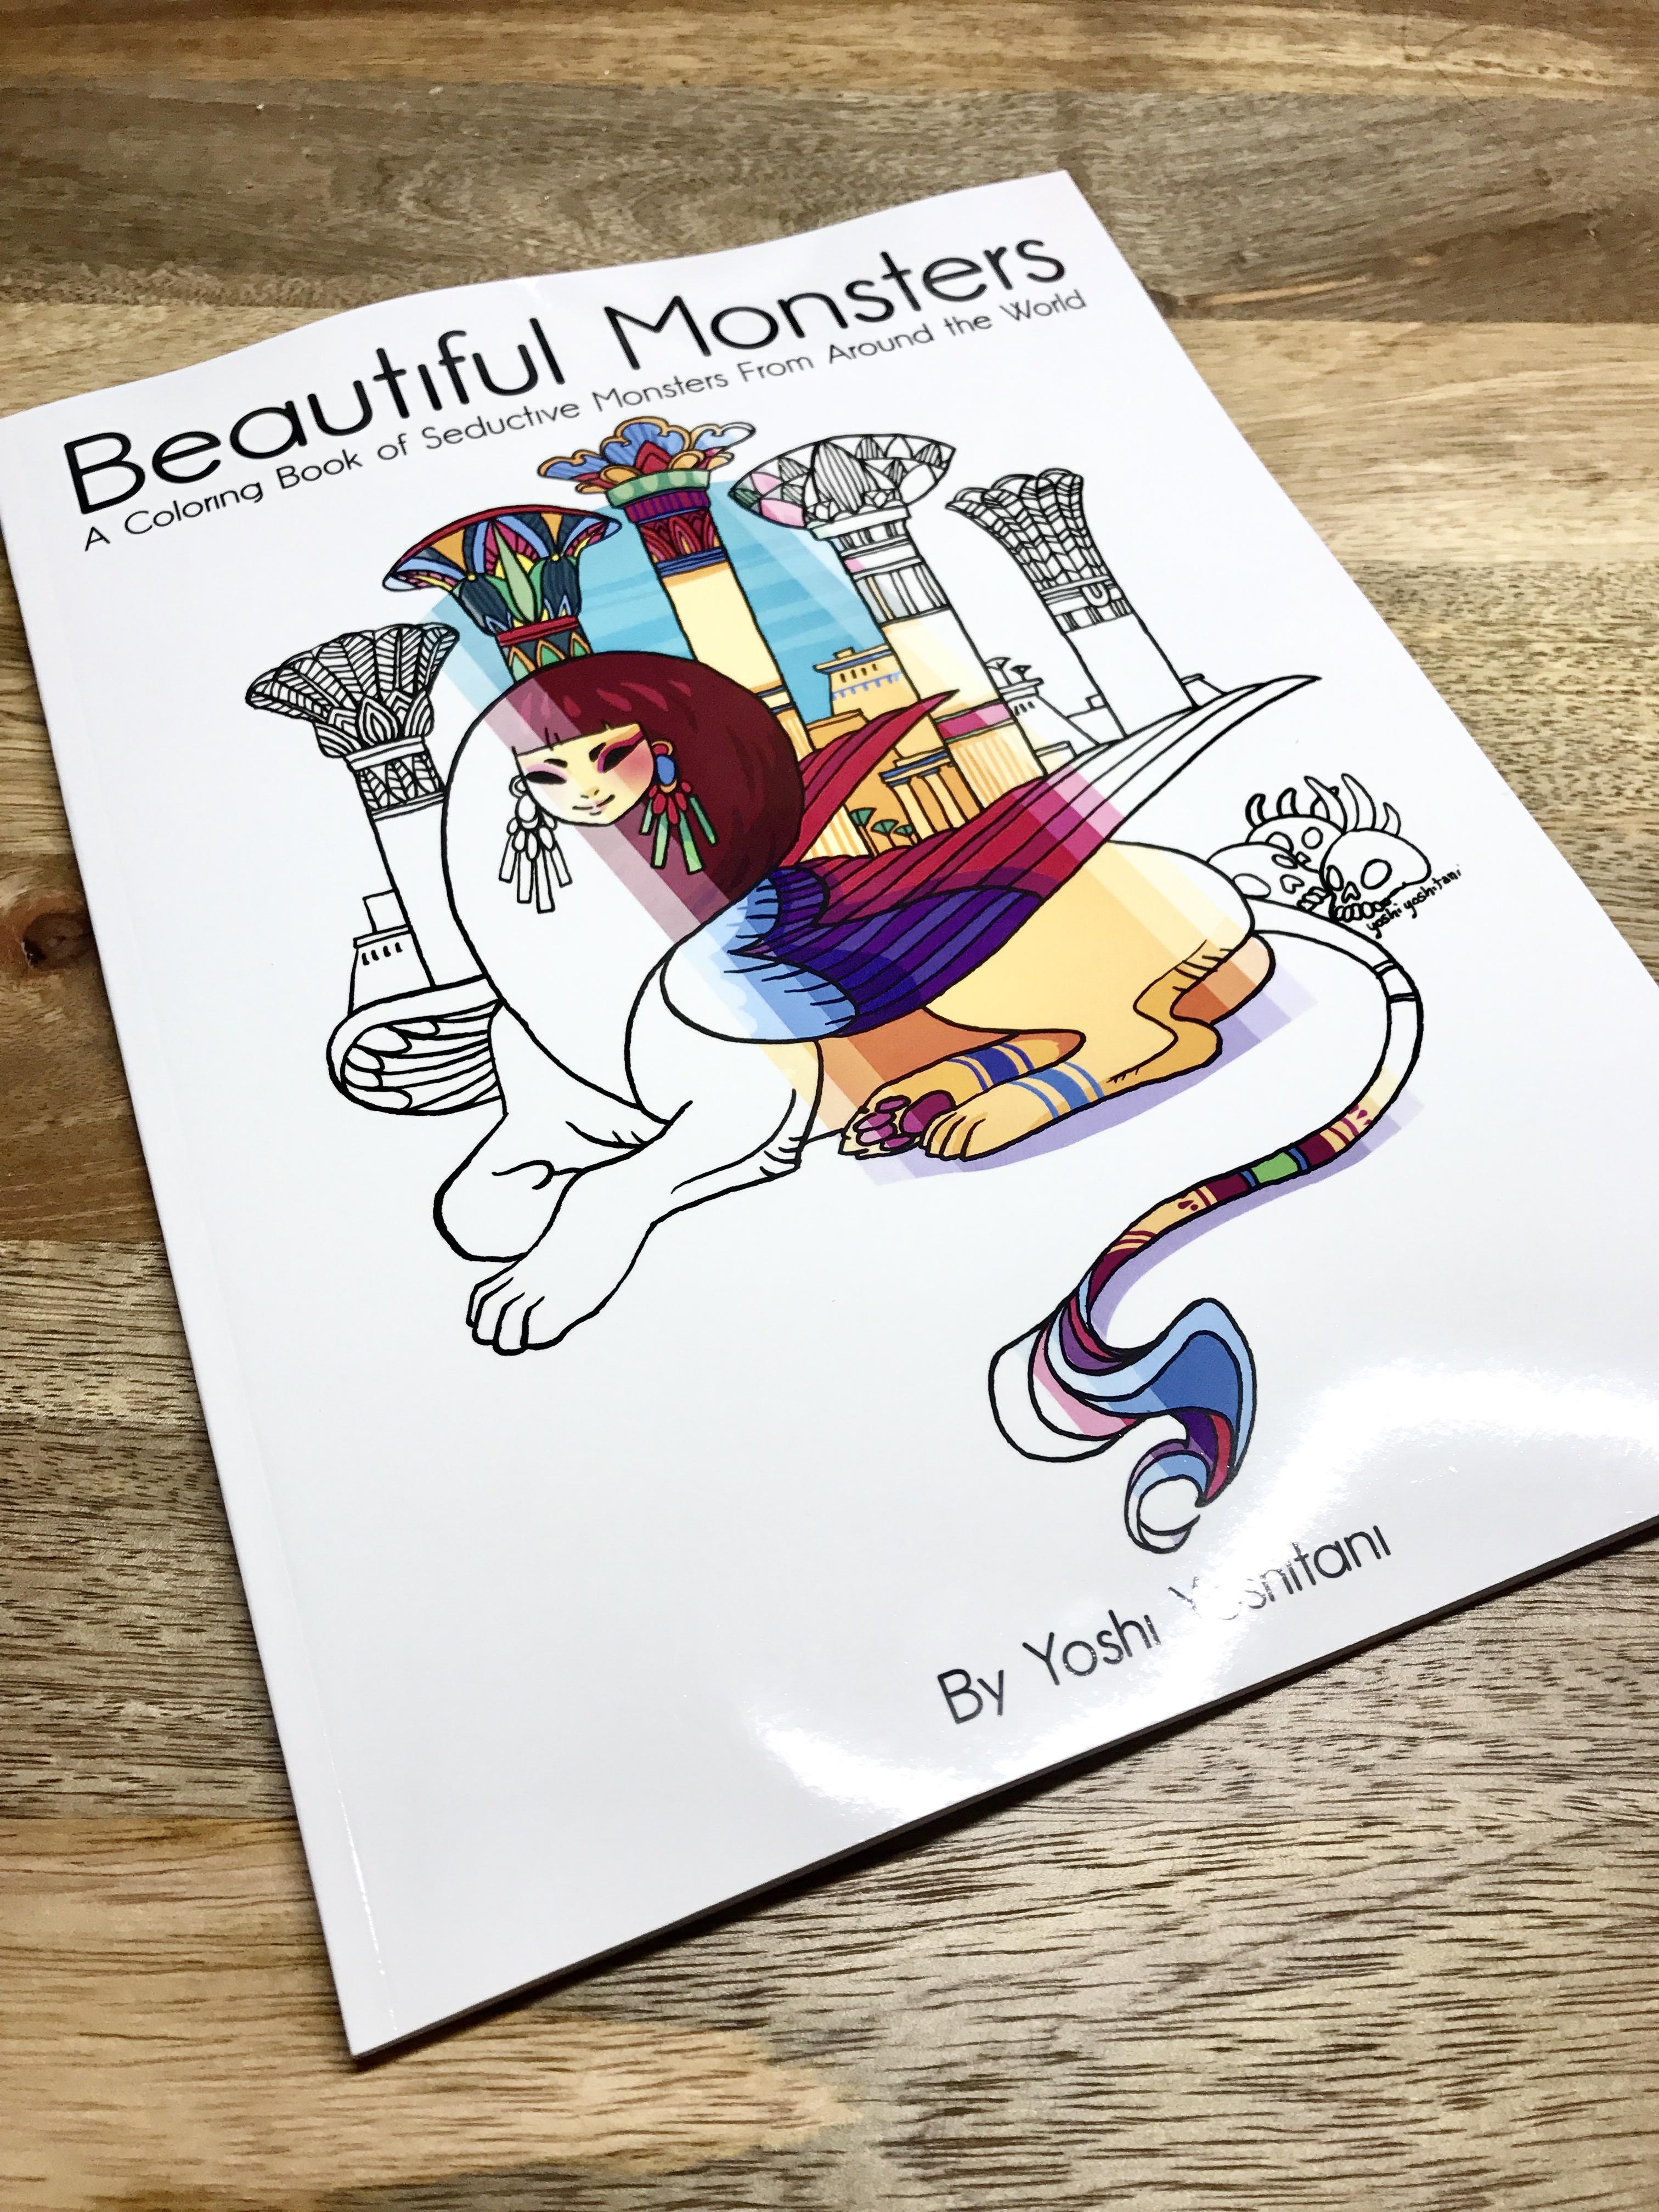 beautiful monsters coloring book yoshi yoshitani online store